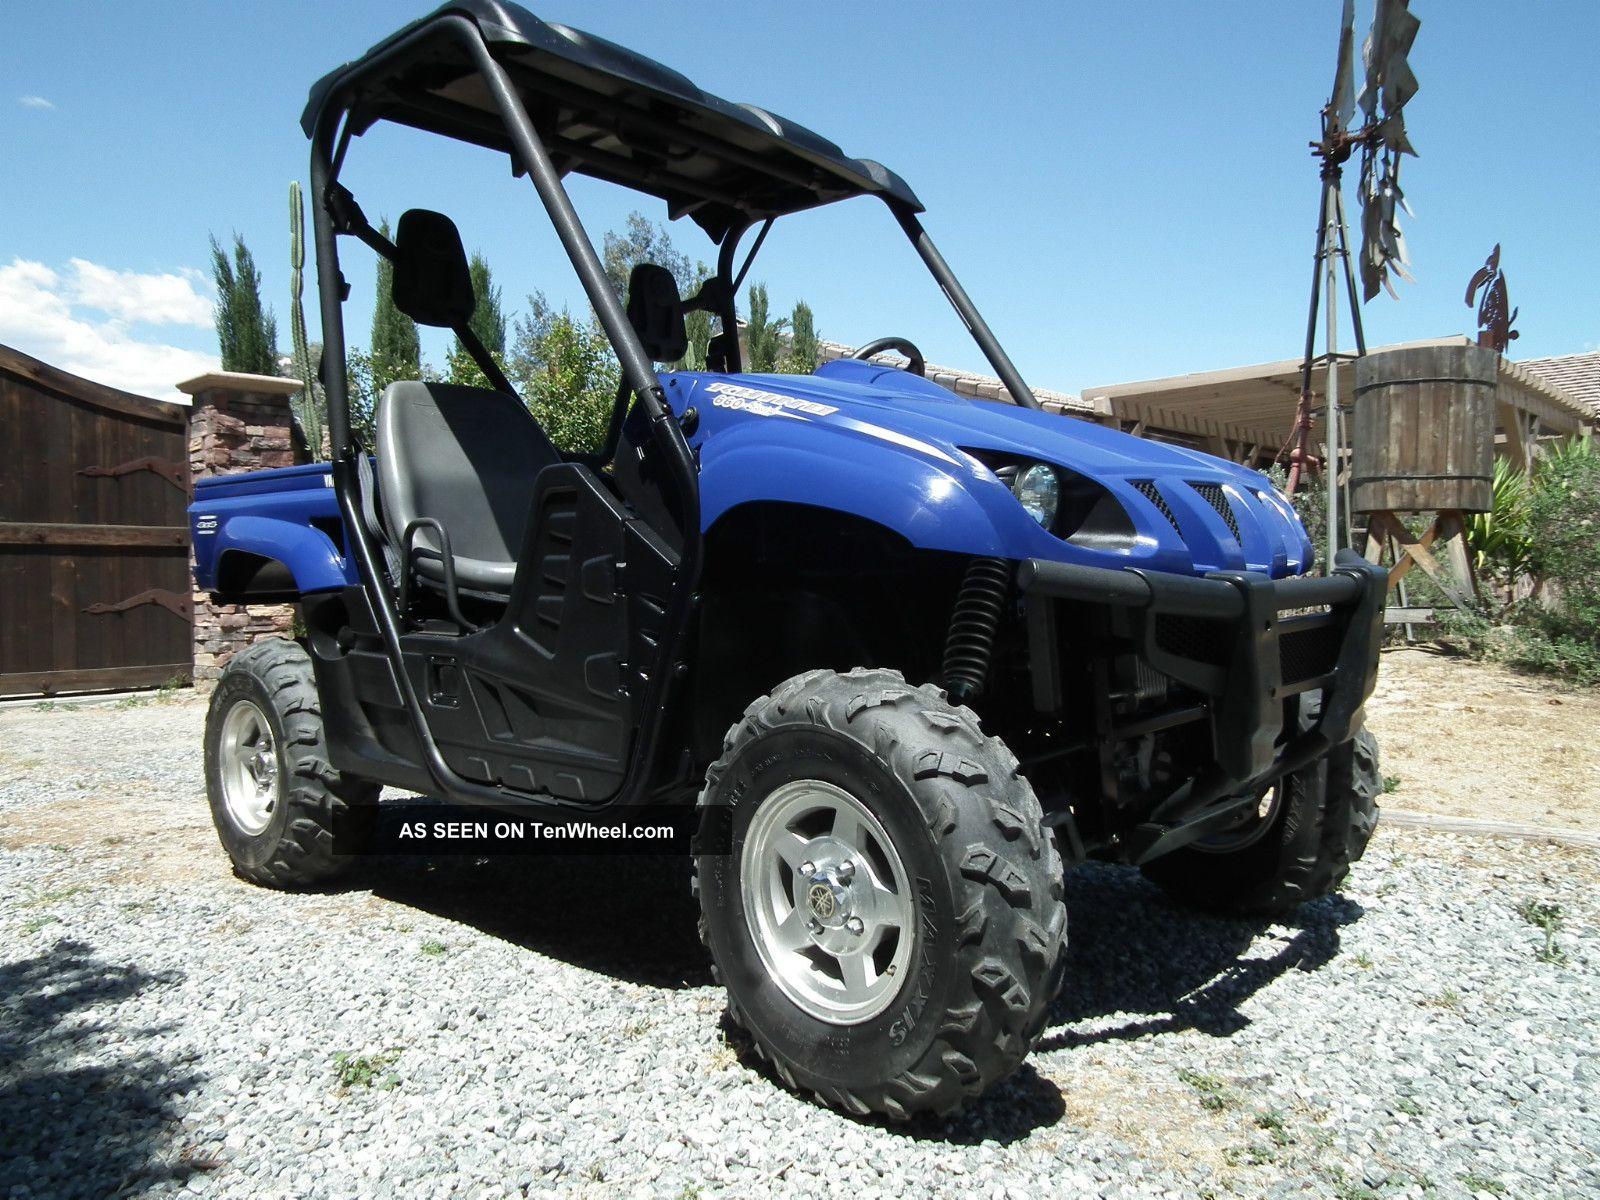 Yamaha Grizzly 660 >> 2007 Yamaha Rhino